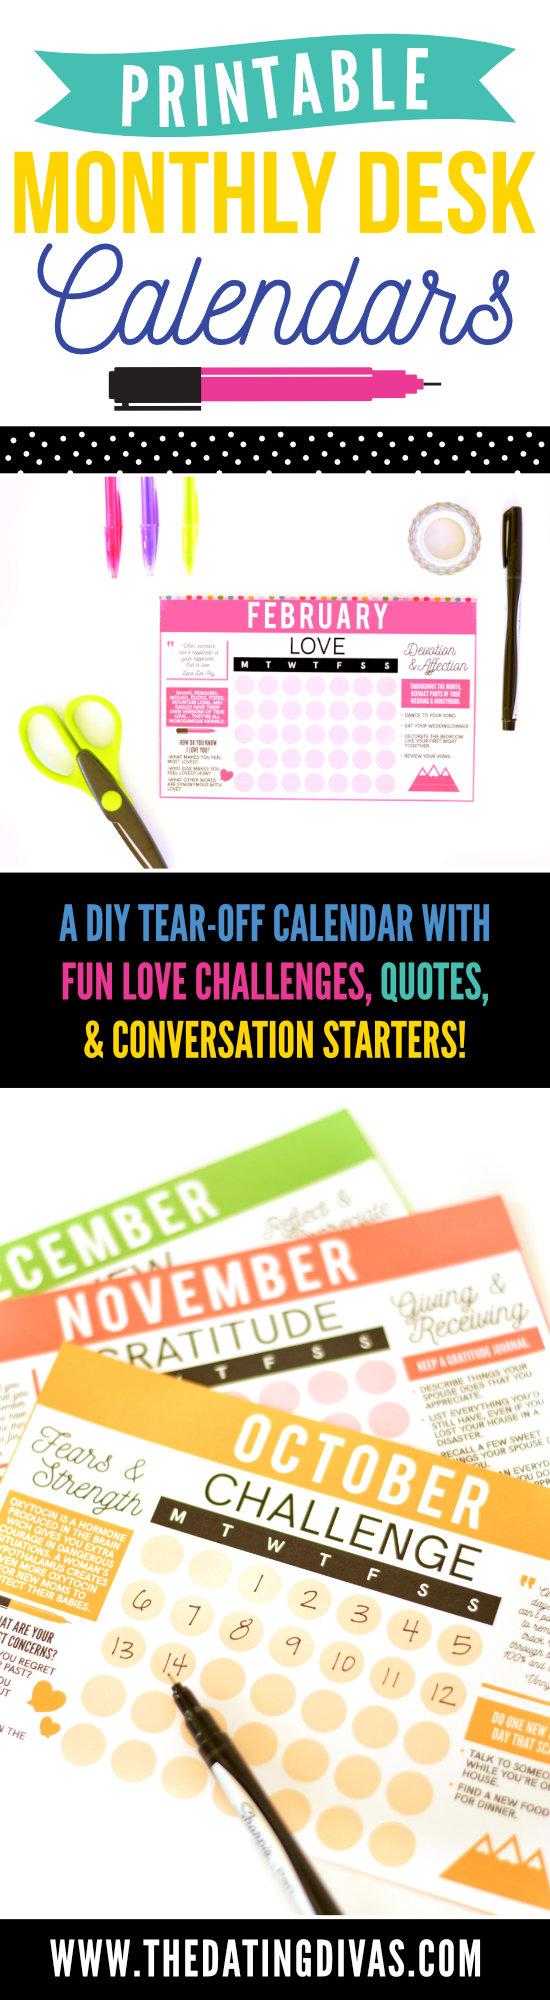 Printable Monthly Desk Calendar #freecalendar #printablecalendar